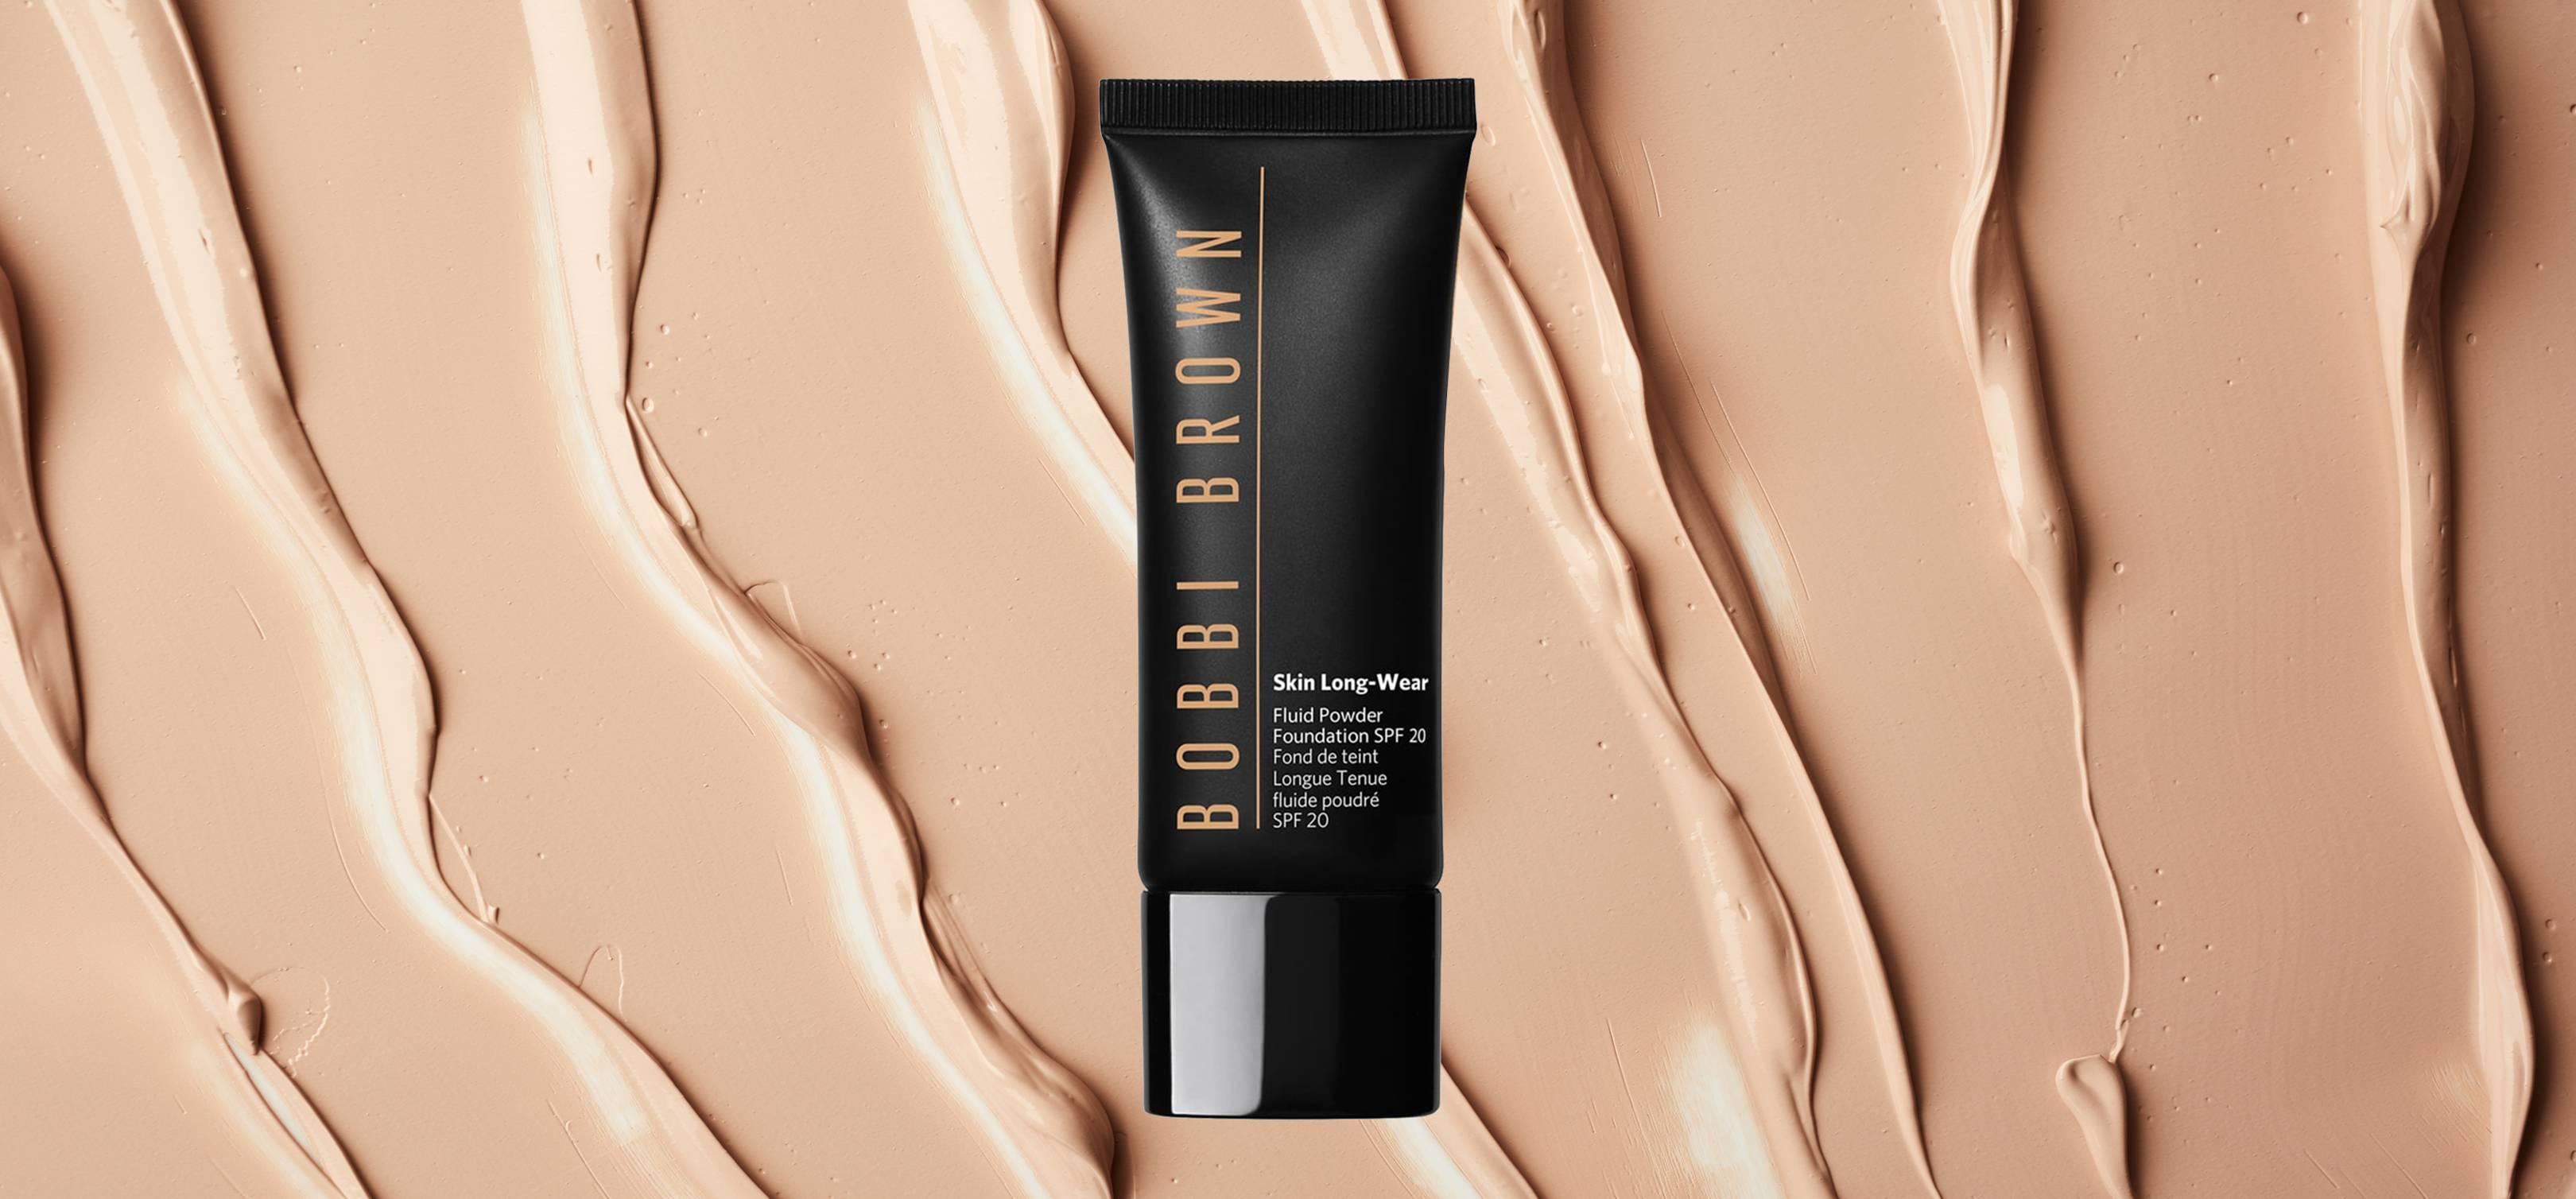 5 Women Test Bobbi Brown Skin Long Wear Fluid Powder Foundation Review Glamour Uk